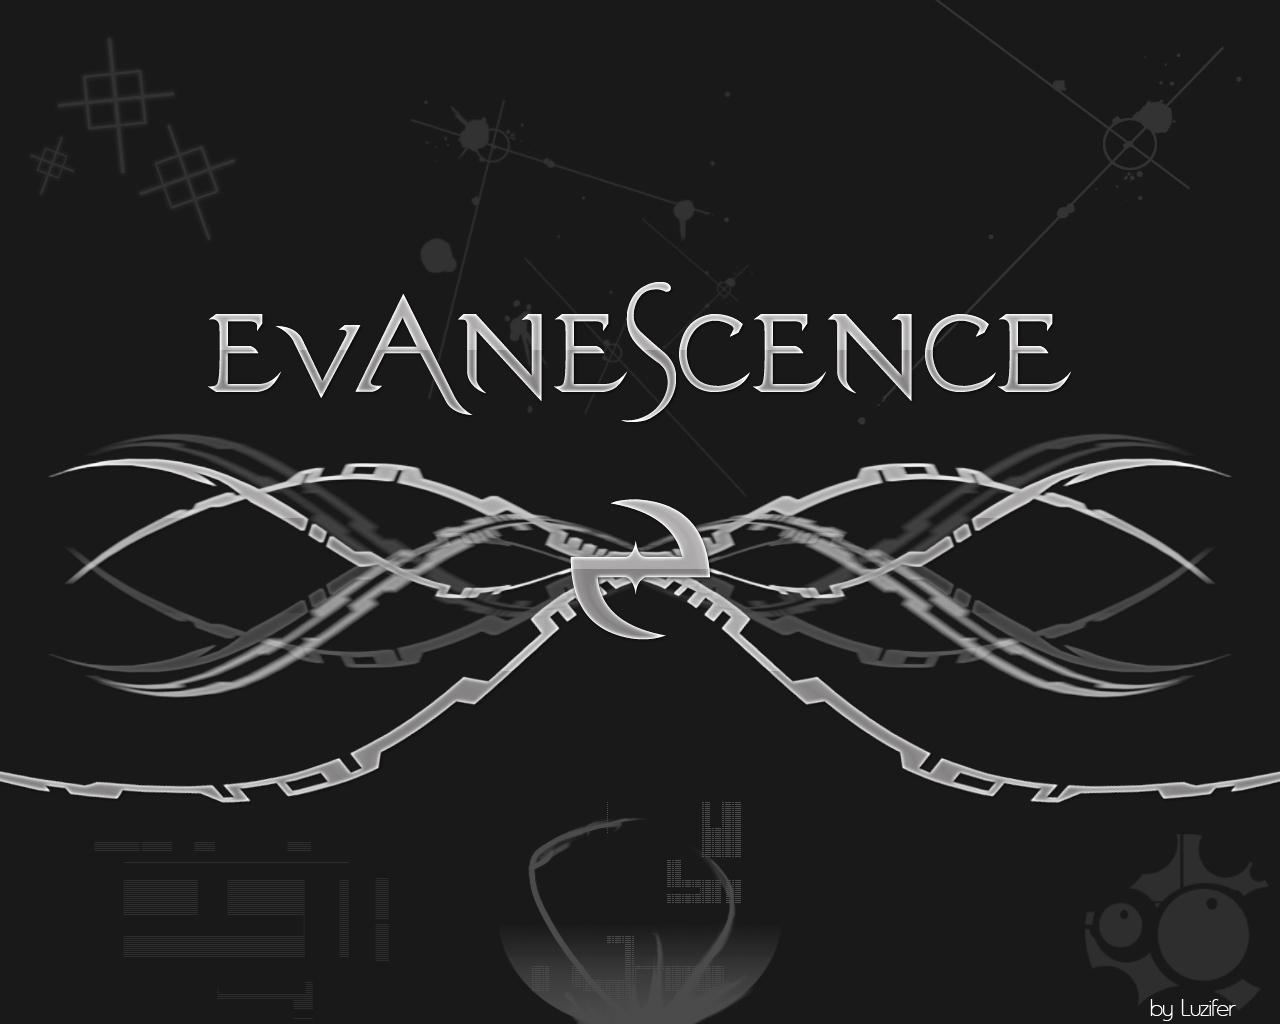 Evanscence   Evanescence Wallpaper 1318991 1280x1024